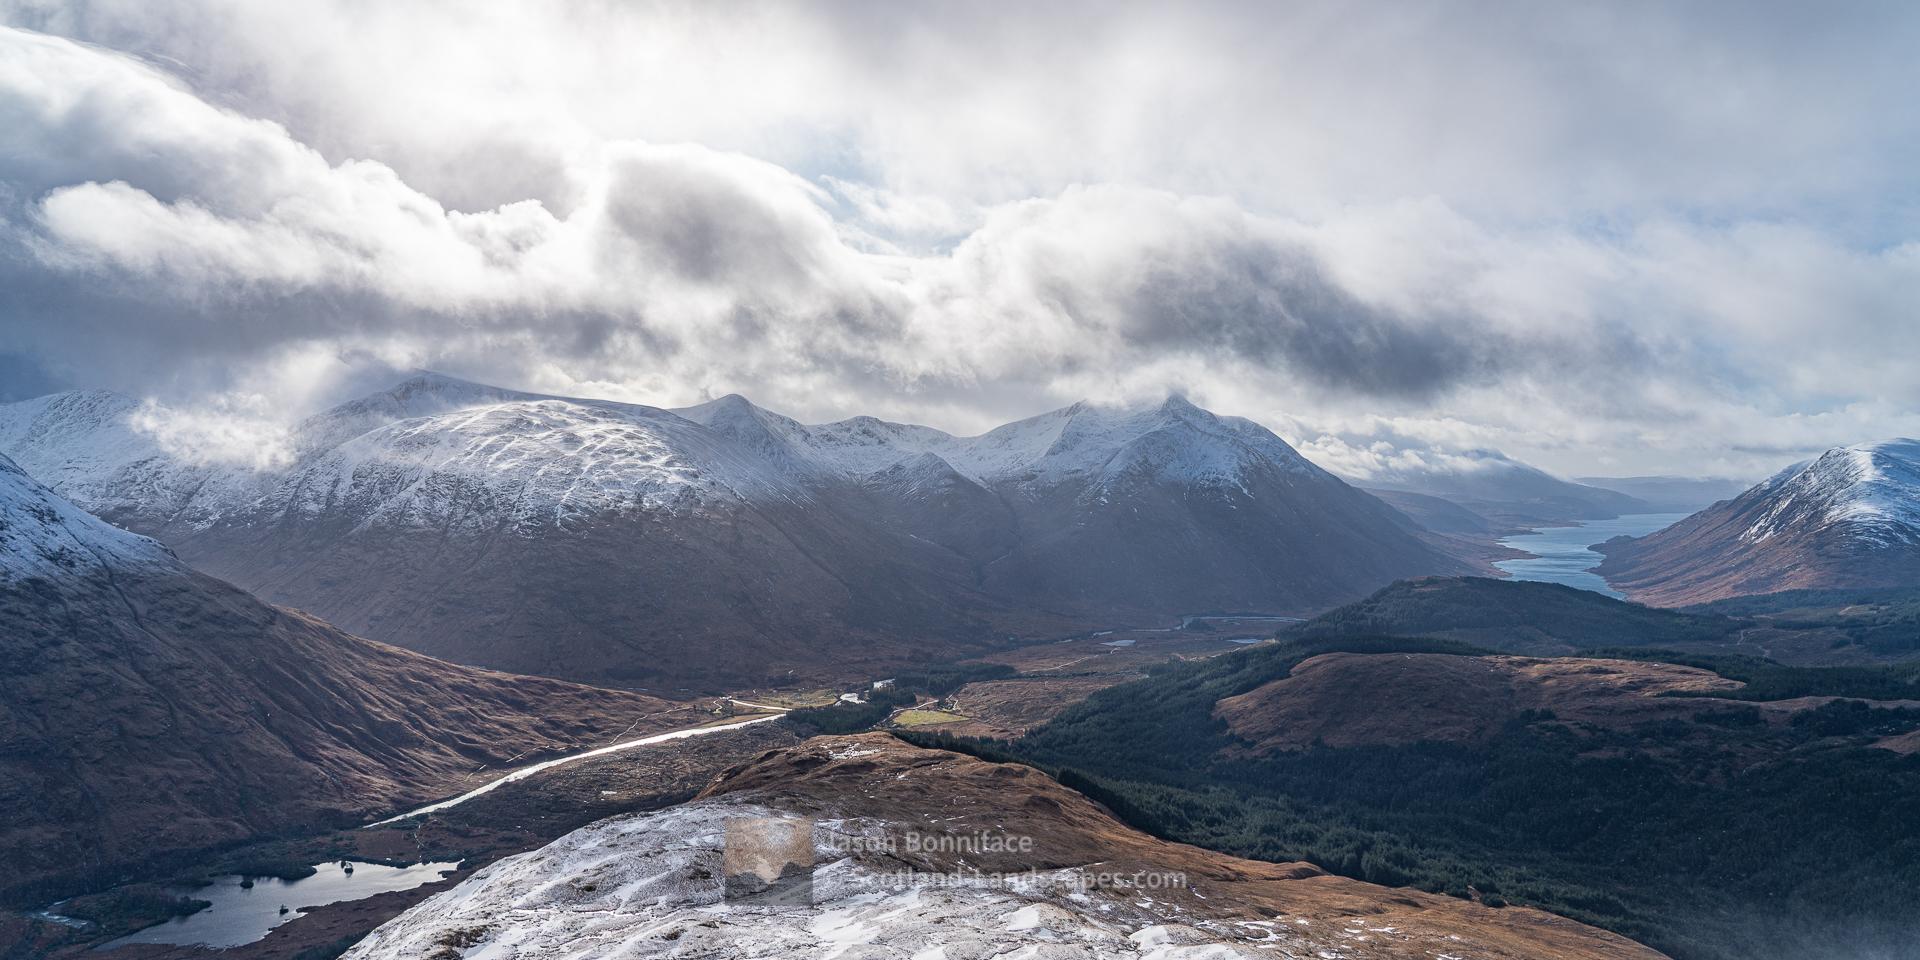 South Down Glen Etive, Lochaber